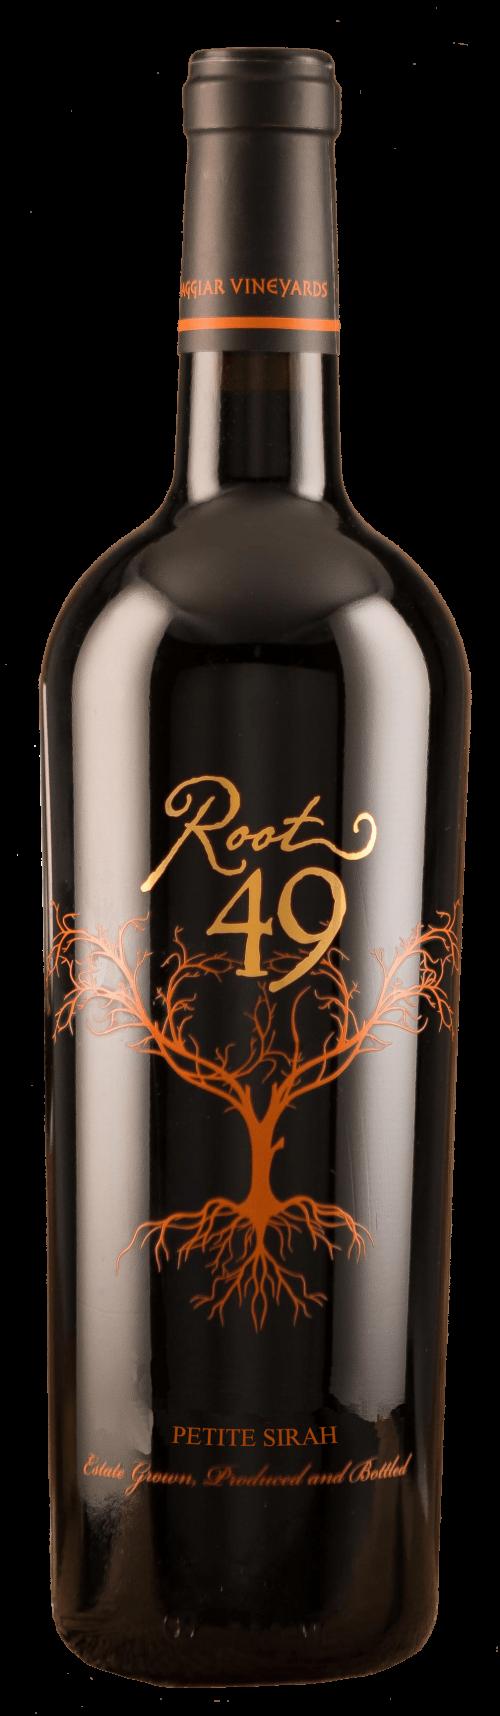 Root 49 Petite Sirah wine bottle